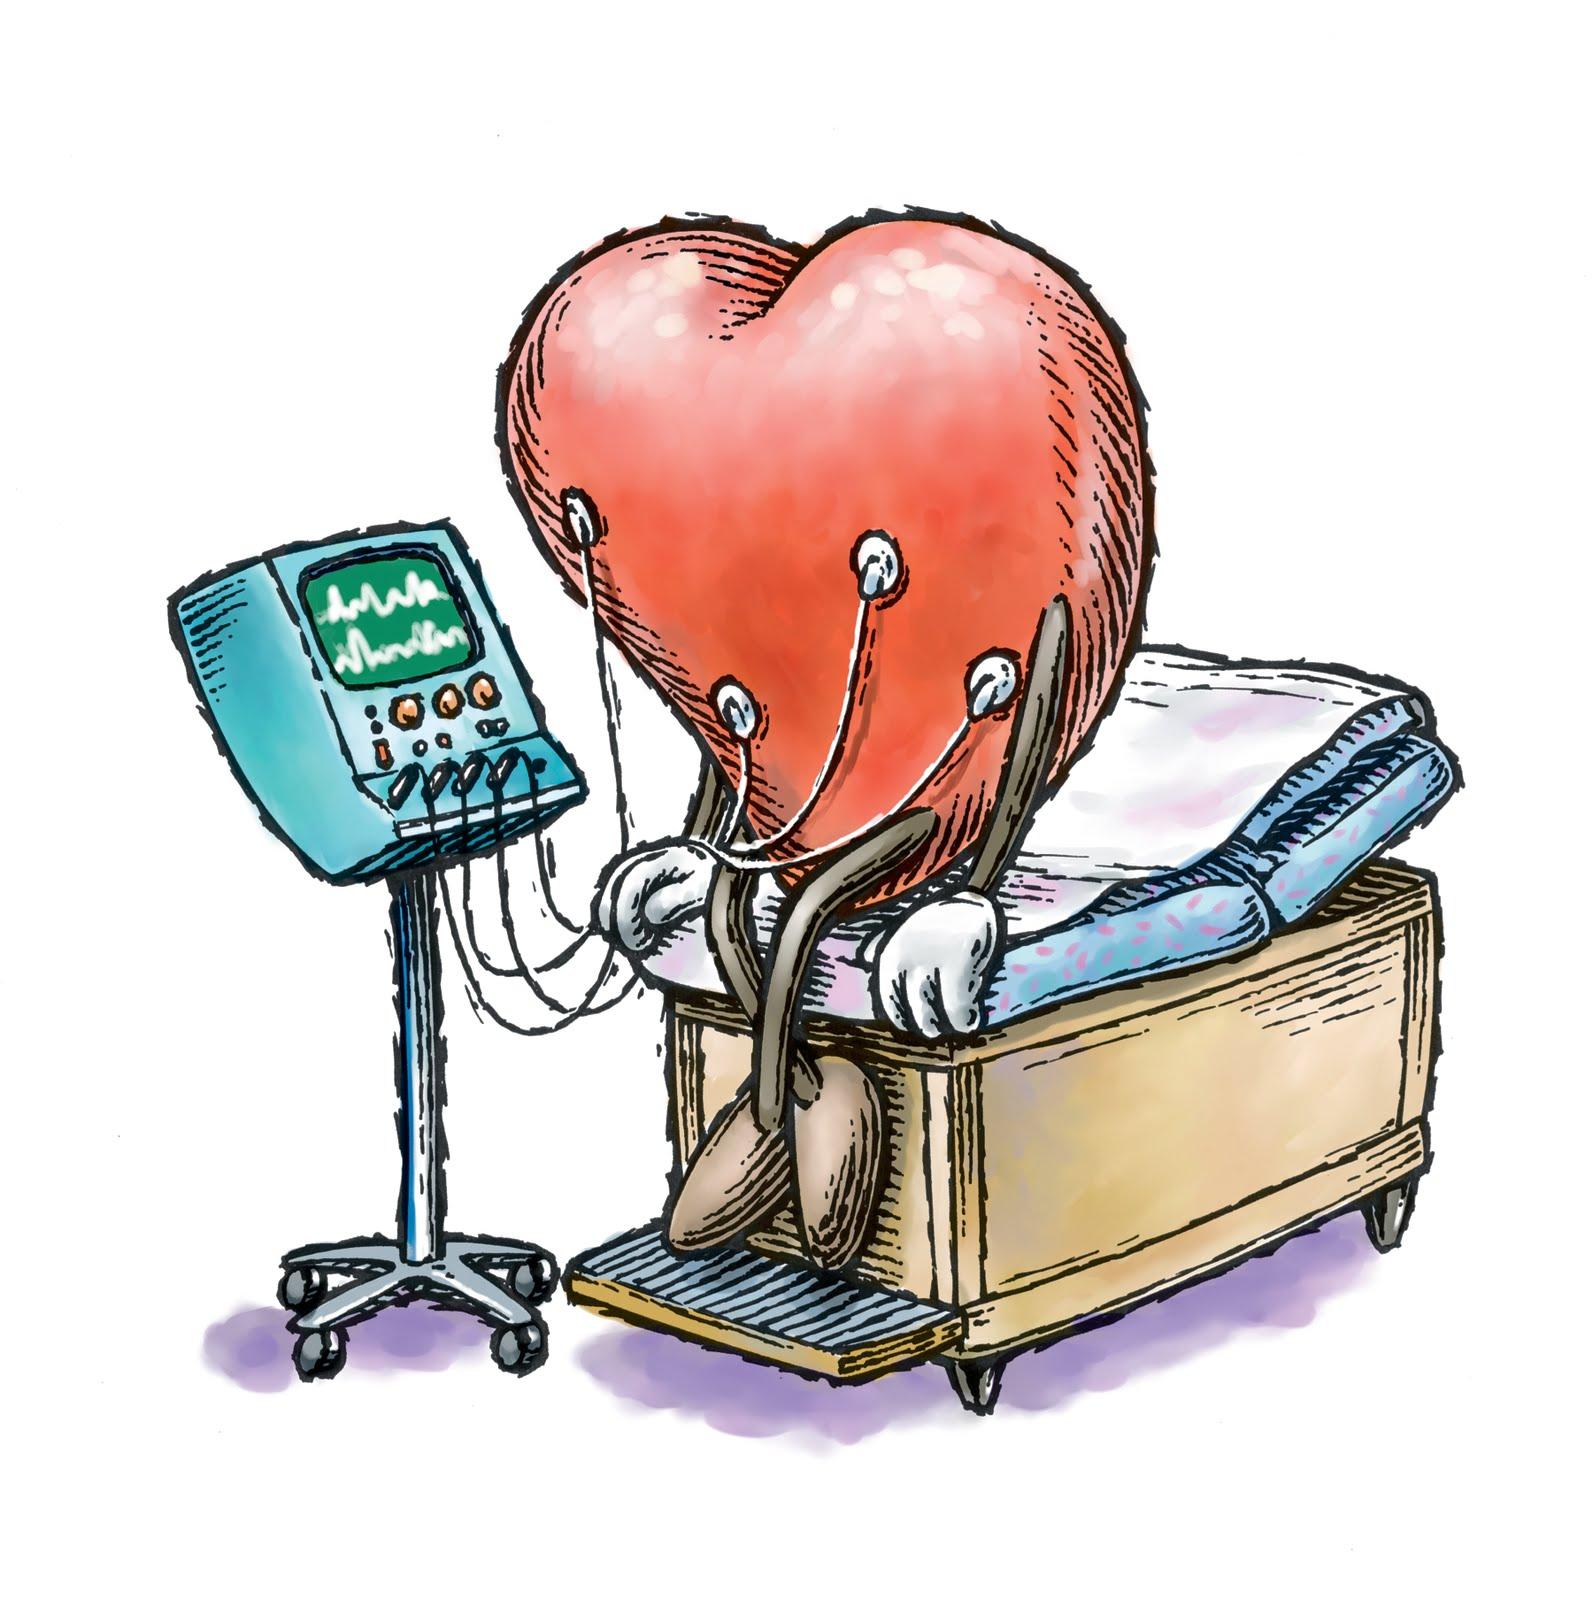 Sentara Potomac Hospital Special Heart Health Screenings Offerred At Sentara Potomac Hospital